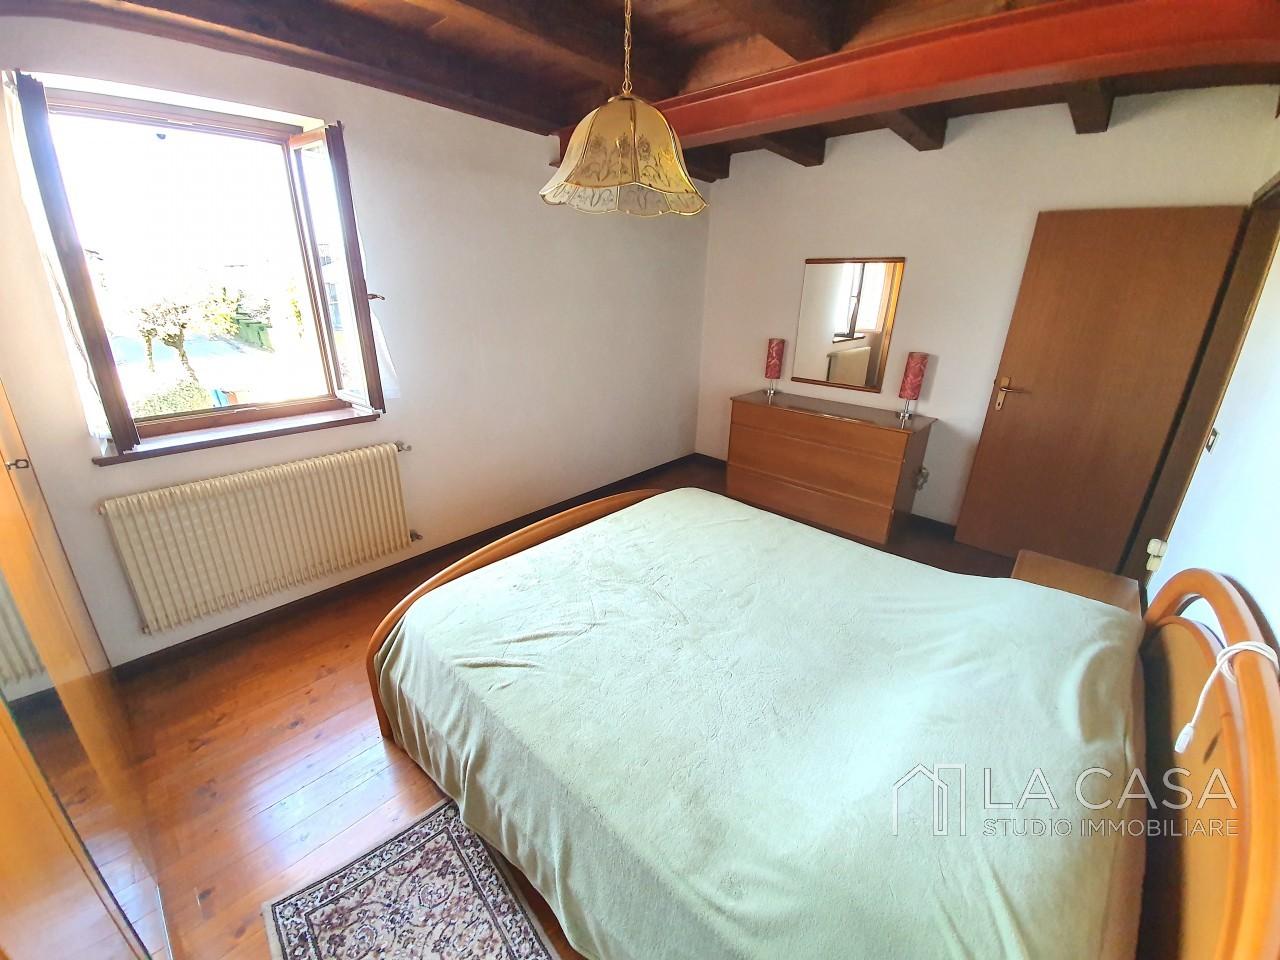 Casa indipendente in Linea - Rif.C6 https://media.gestionaleimmobiliare.it/foto/annunci/191125/2114313/1280x1280/016__20191125_115838_wmk_1.jpg